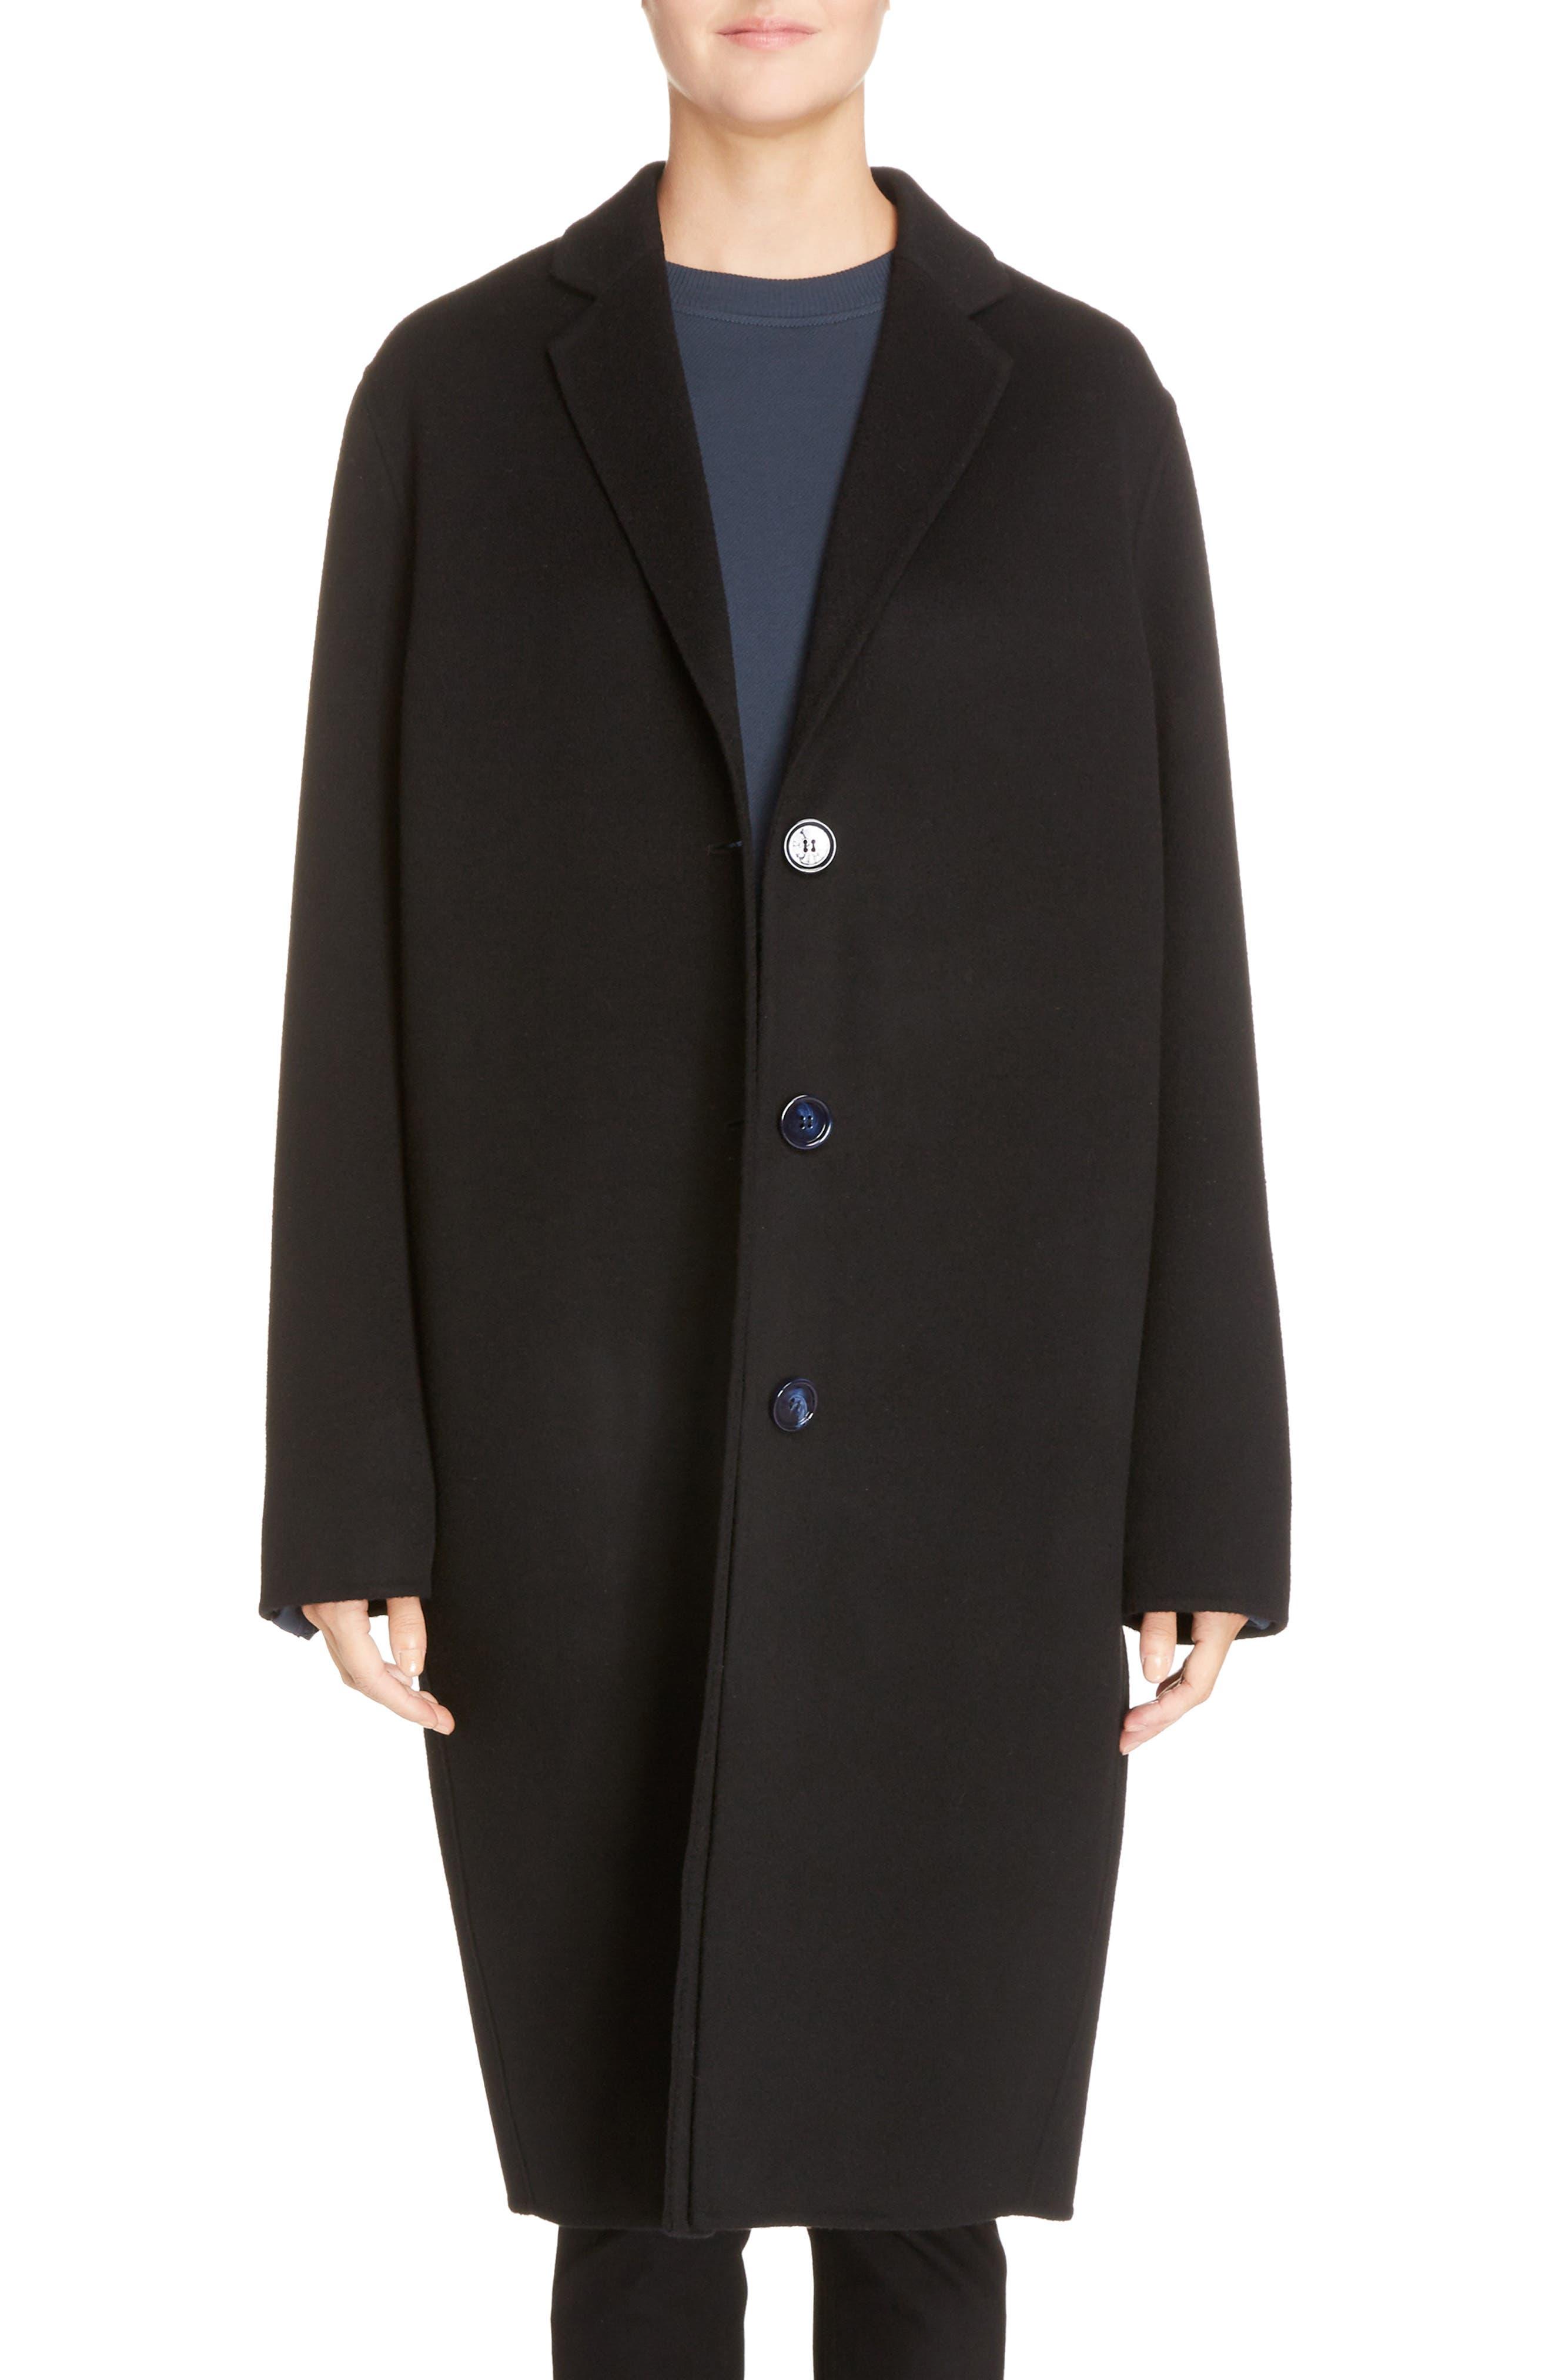 Avalon Wool & Cashmere Coat,                             Main thumbnail 1, color,                             Black